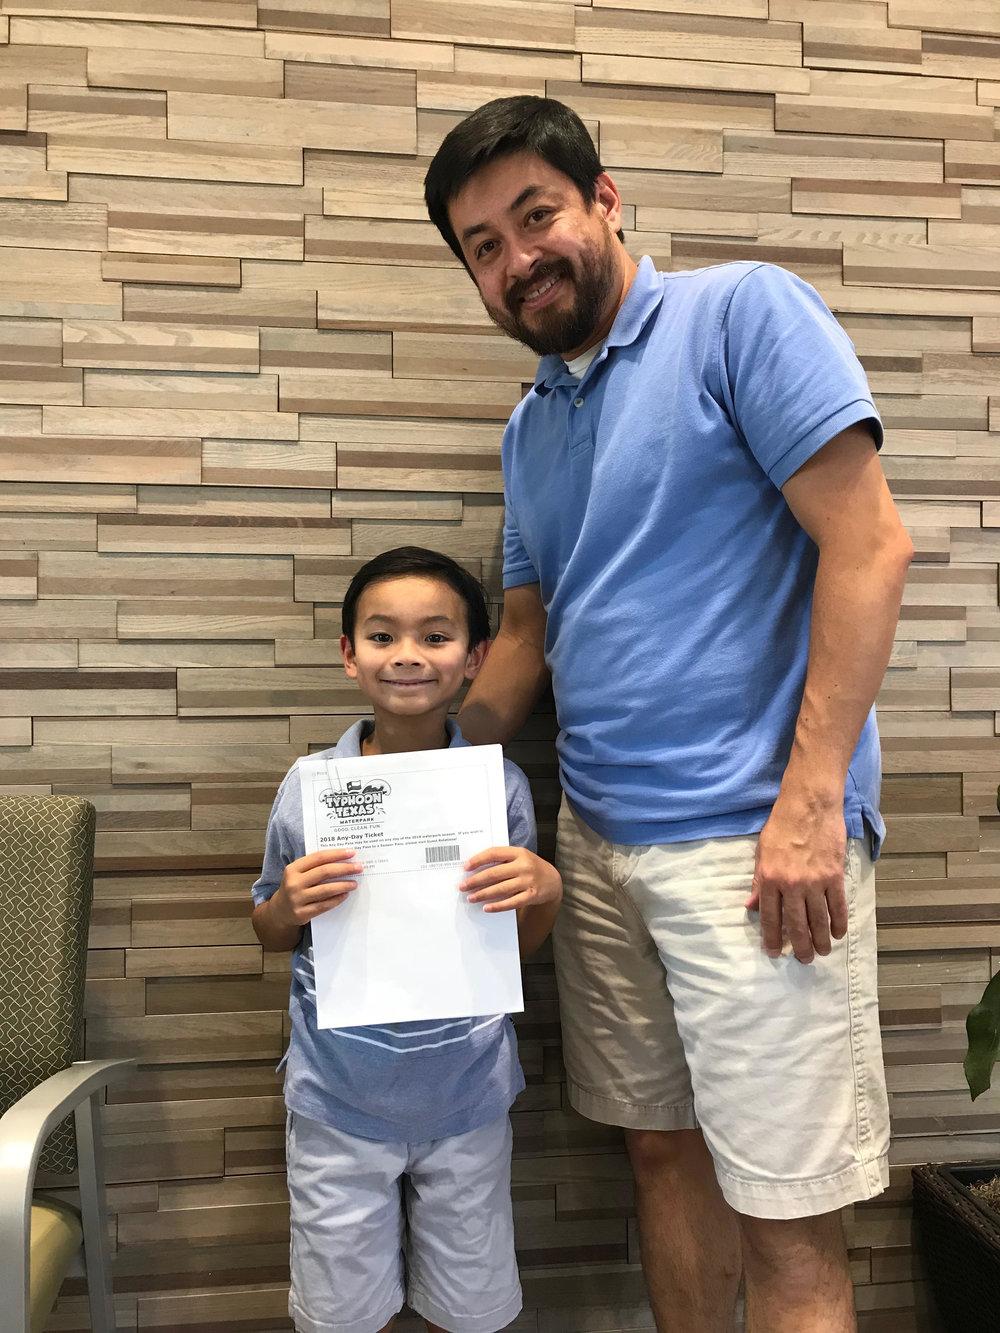 July Winner: 4 Tickets to Typhoon Texas